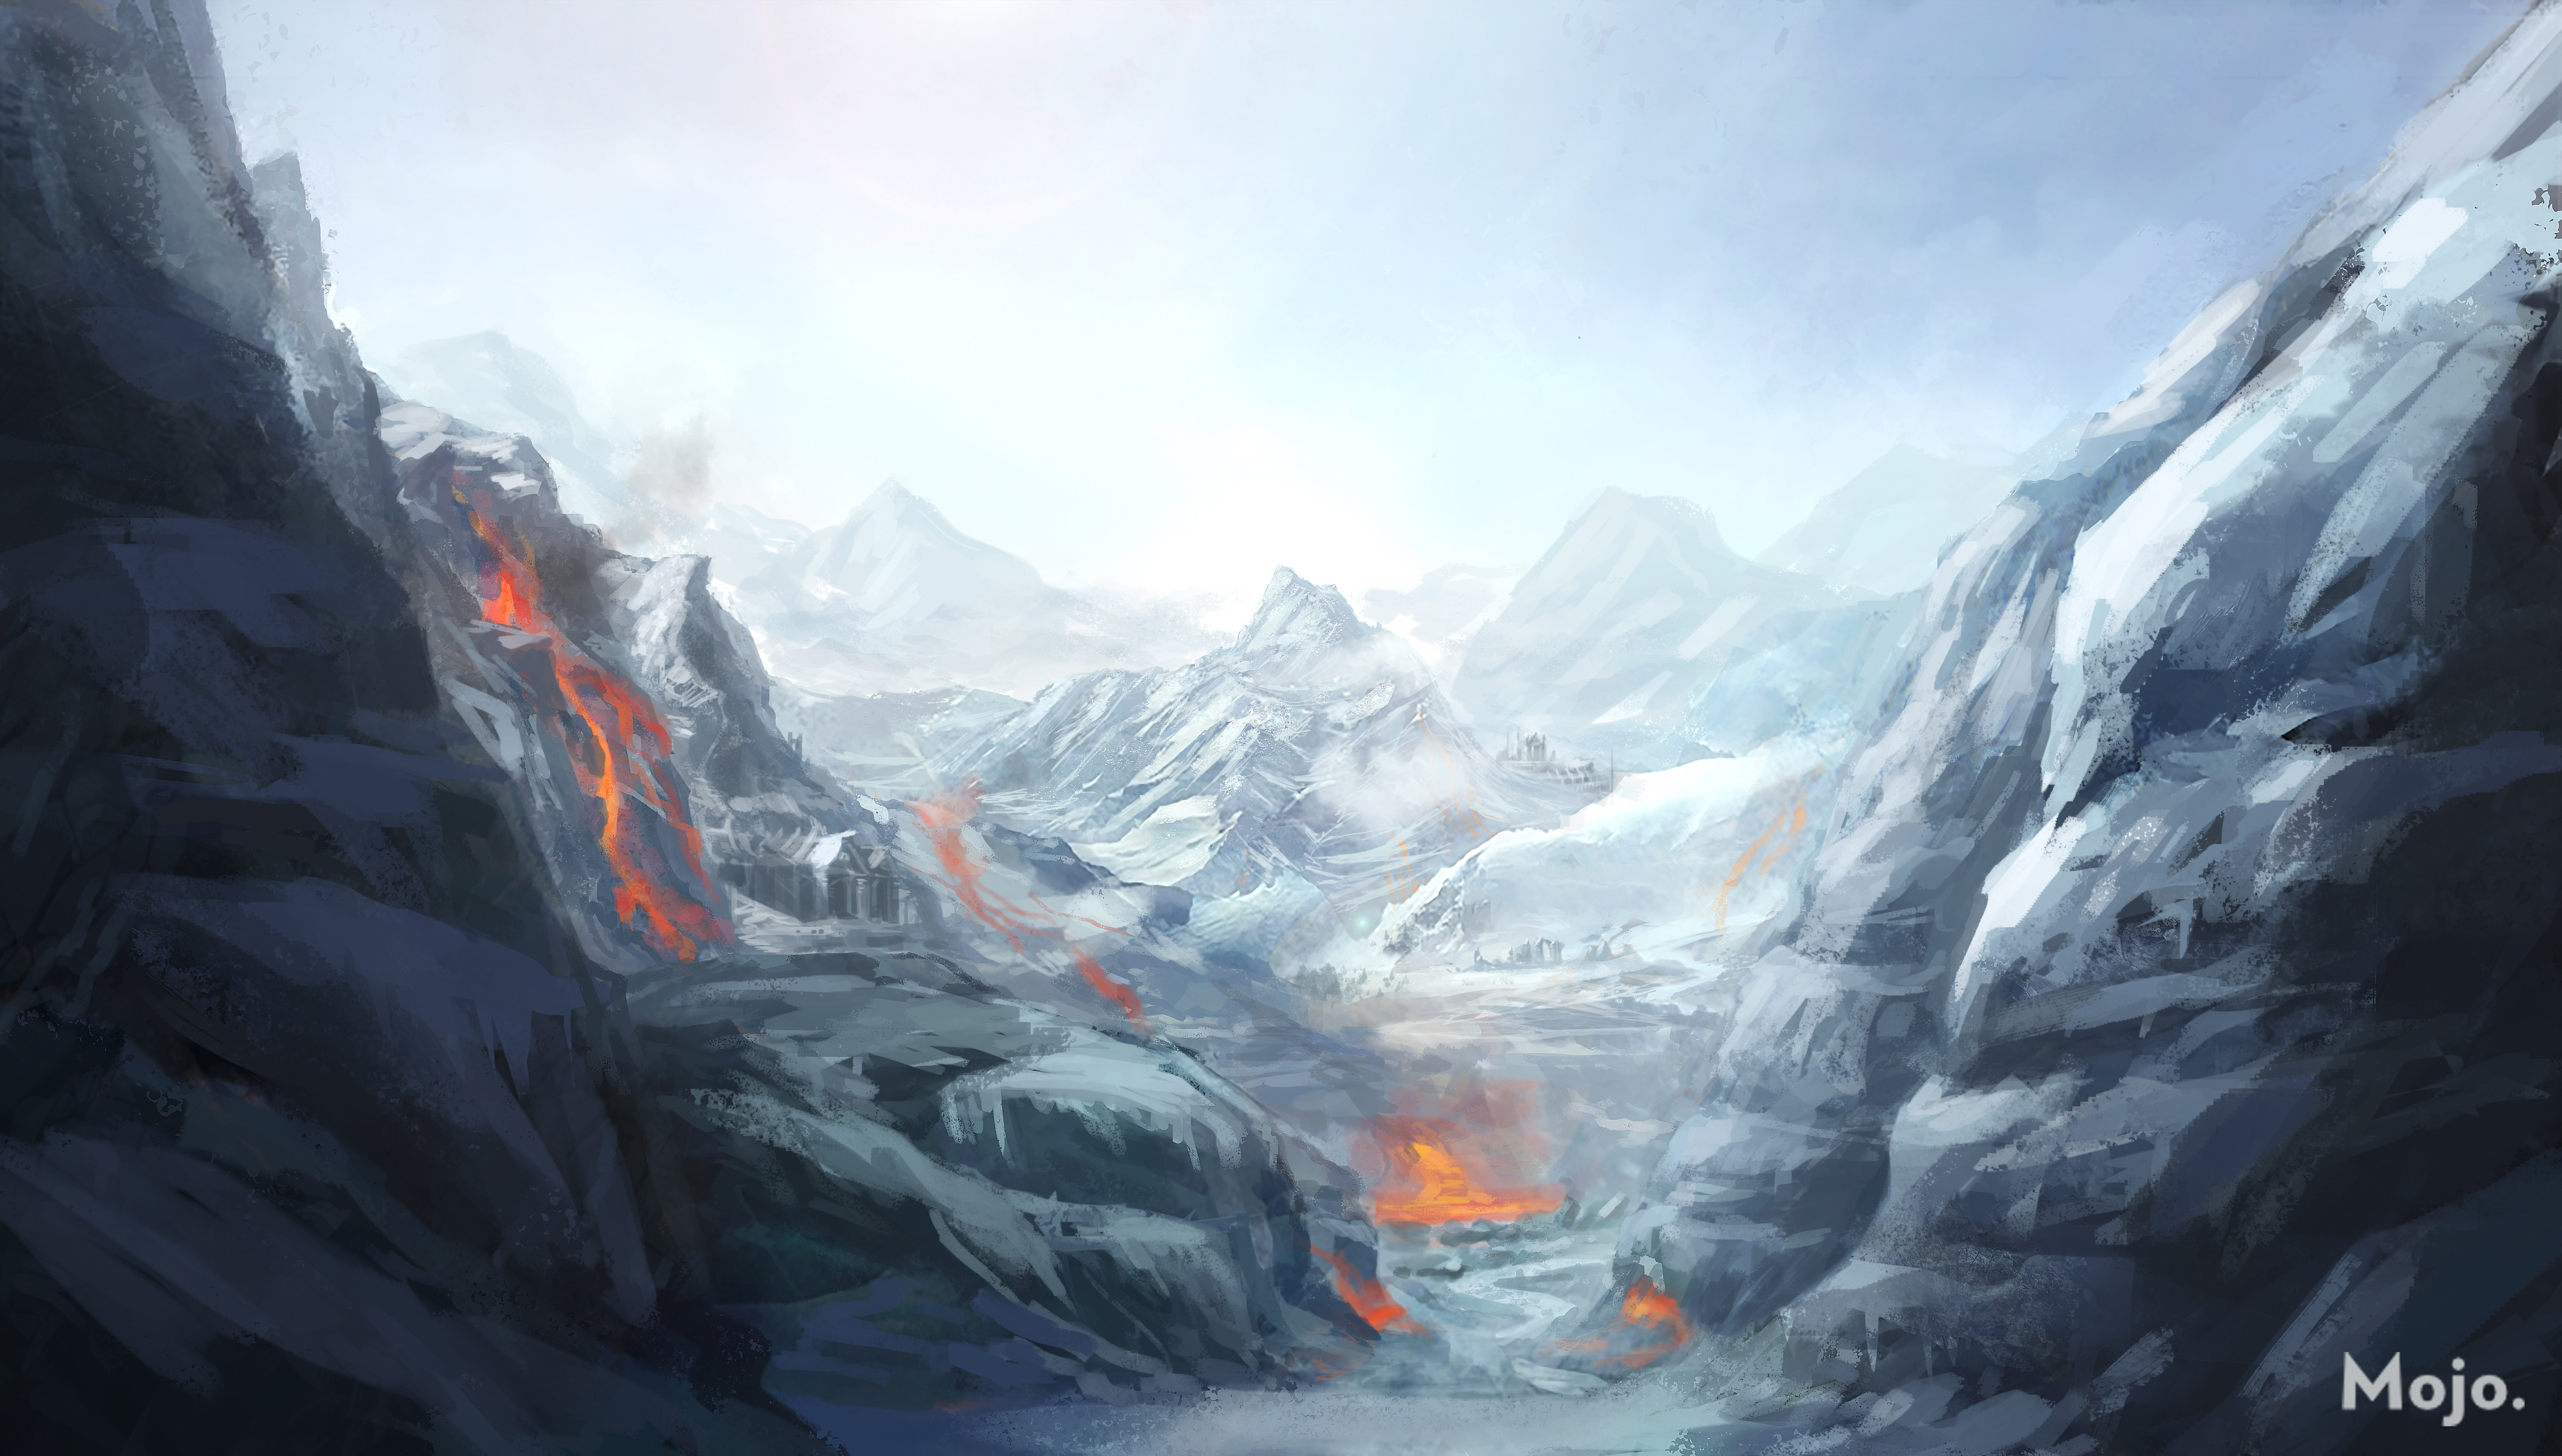 Icelands scene final edit